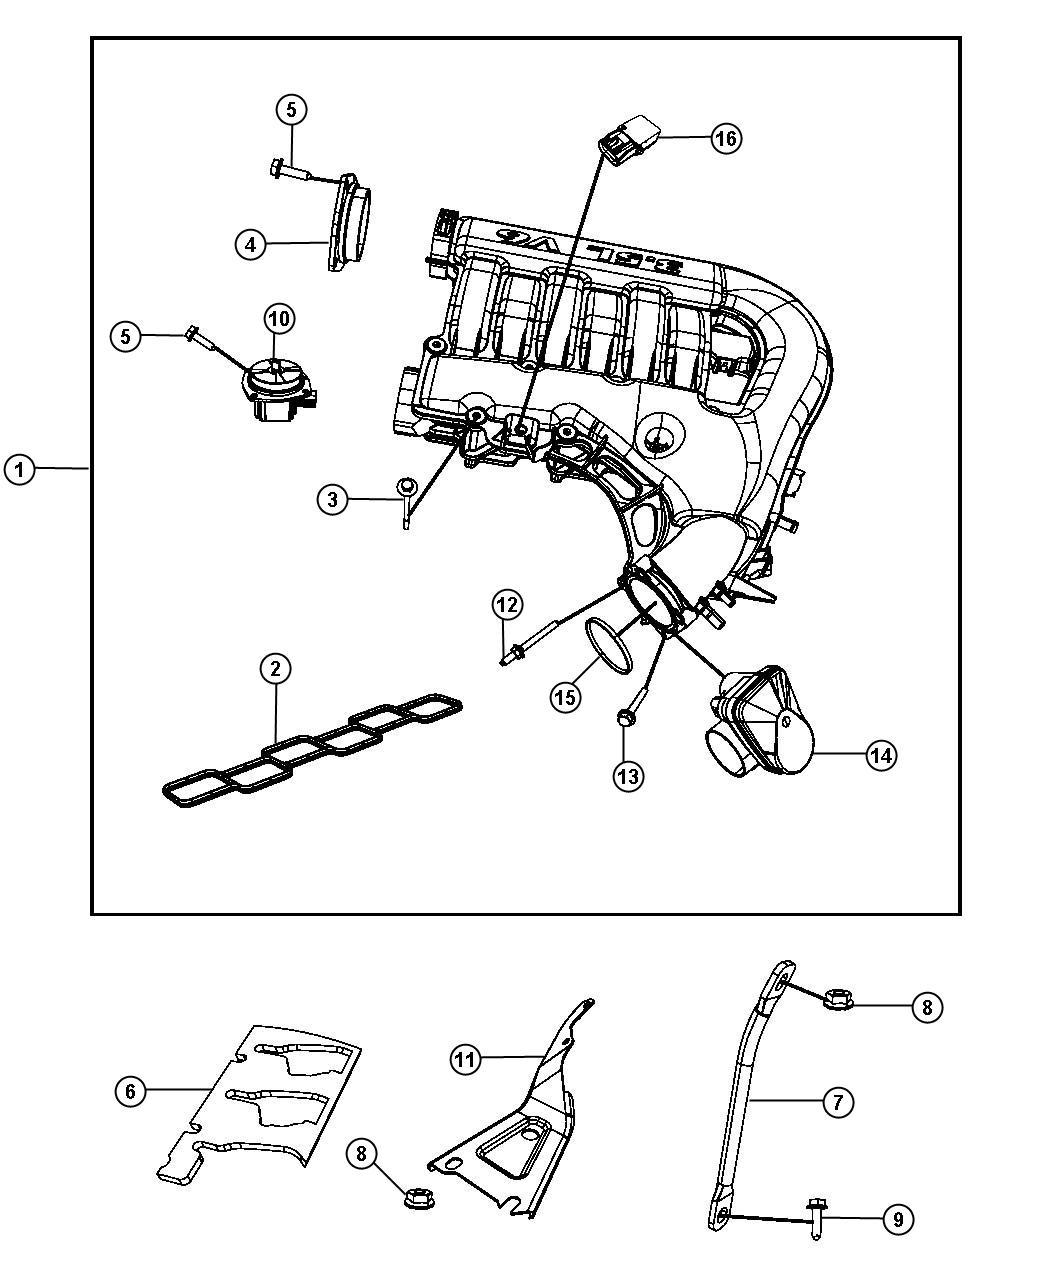 Dodge Charger Cover. Manifold tuning valve. Plenum, engine